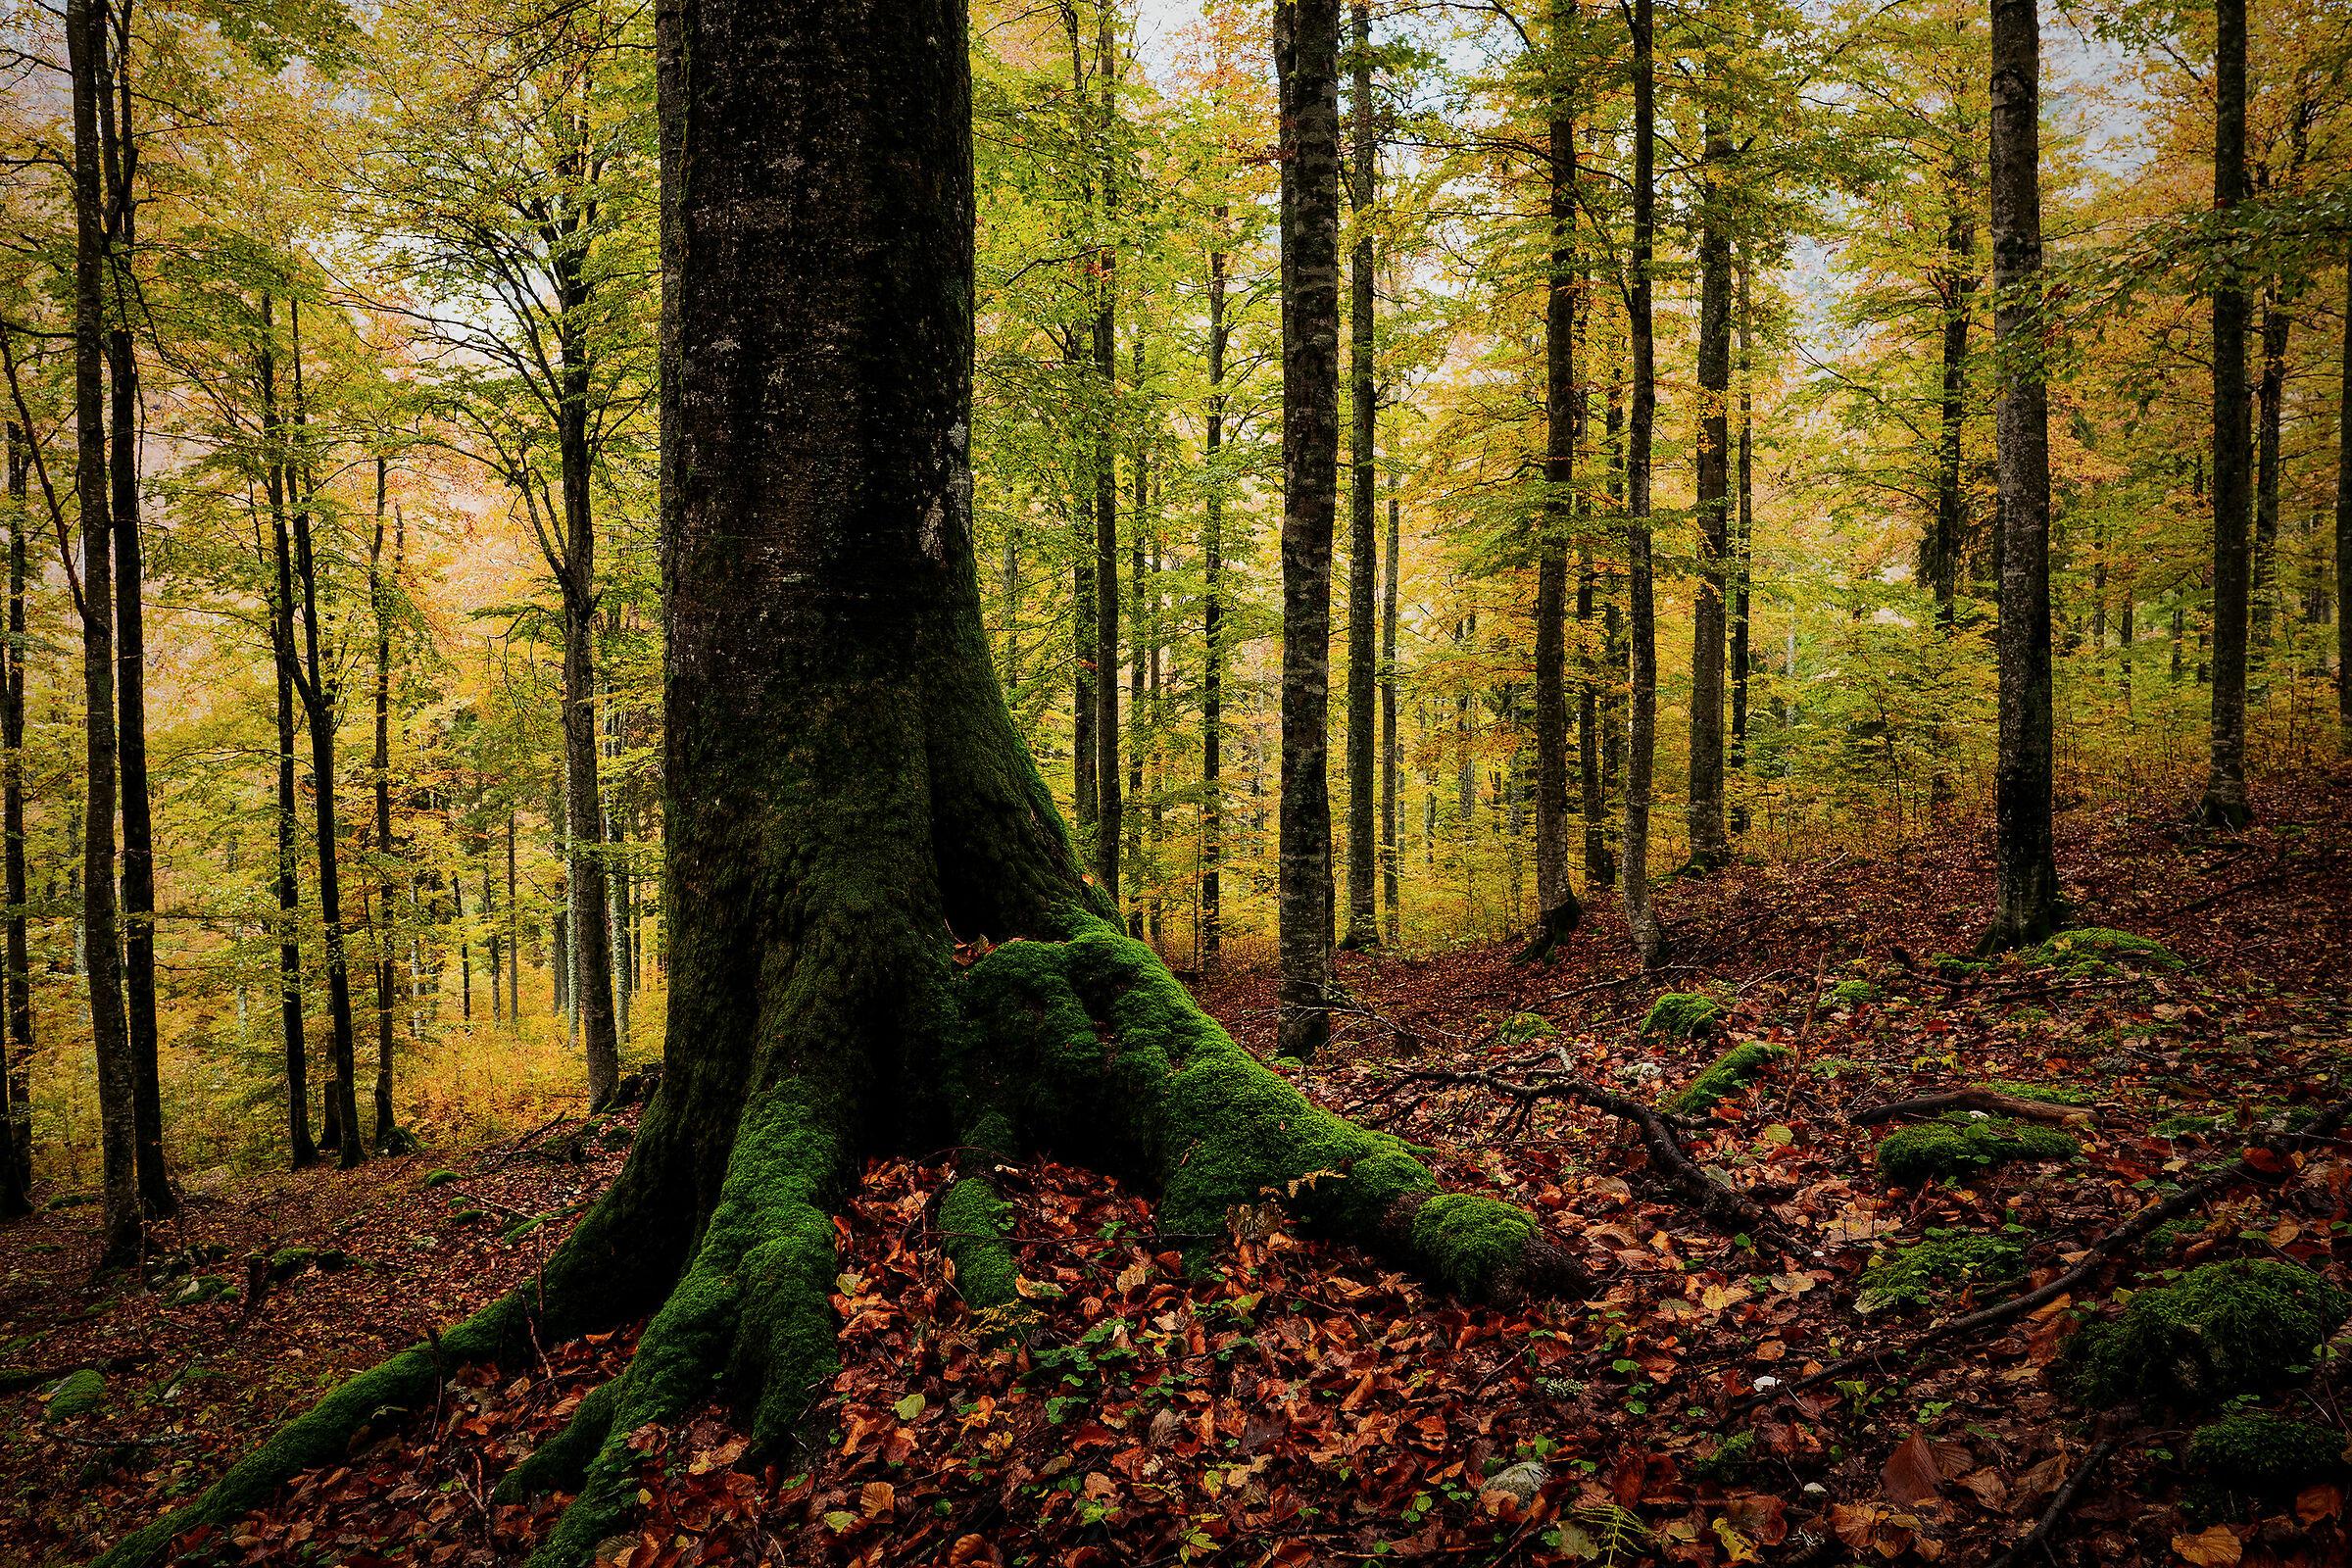 Foresta di Tarvisio - Alpi Giulie - Italy   JuzaPhoto